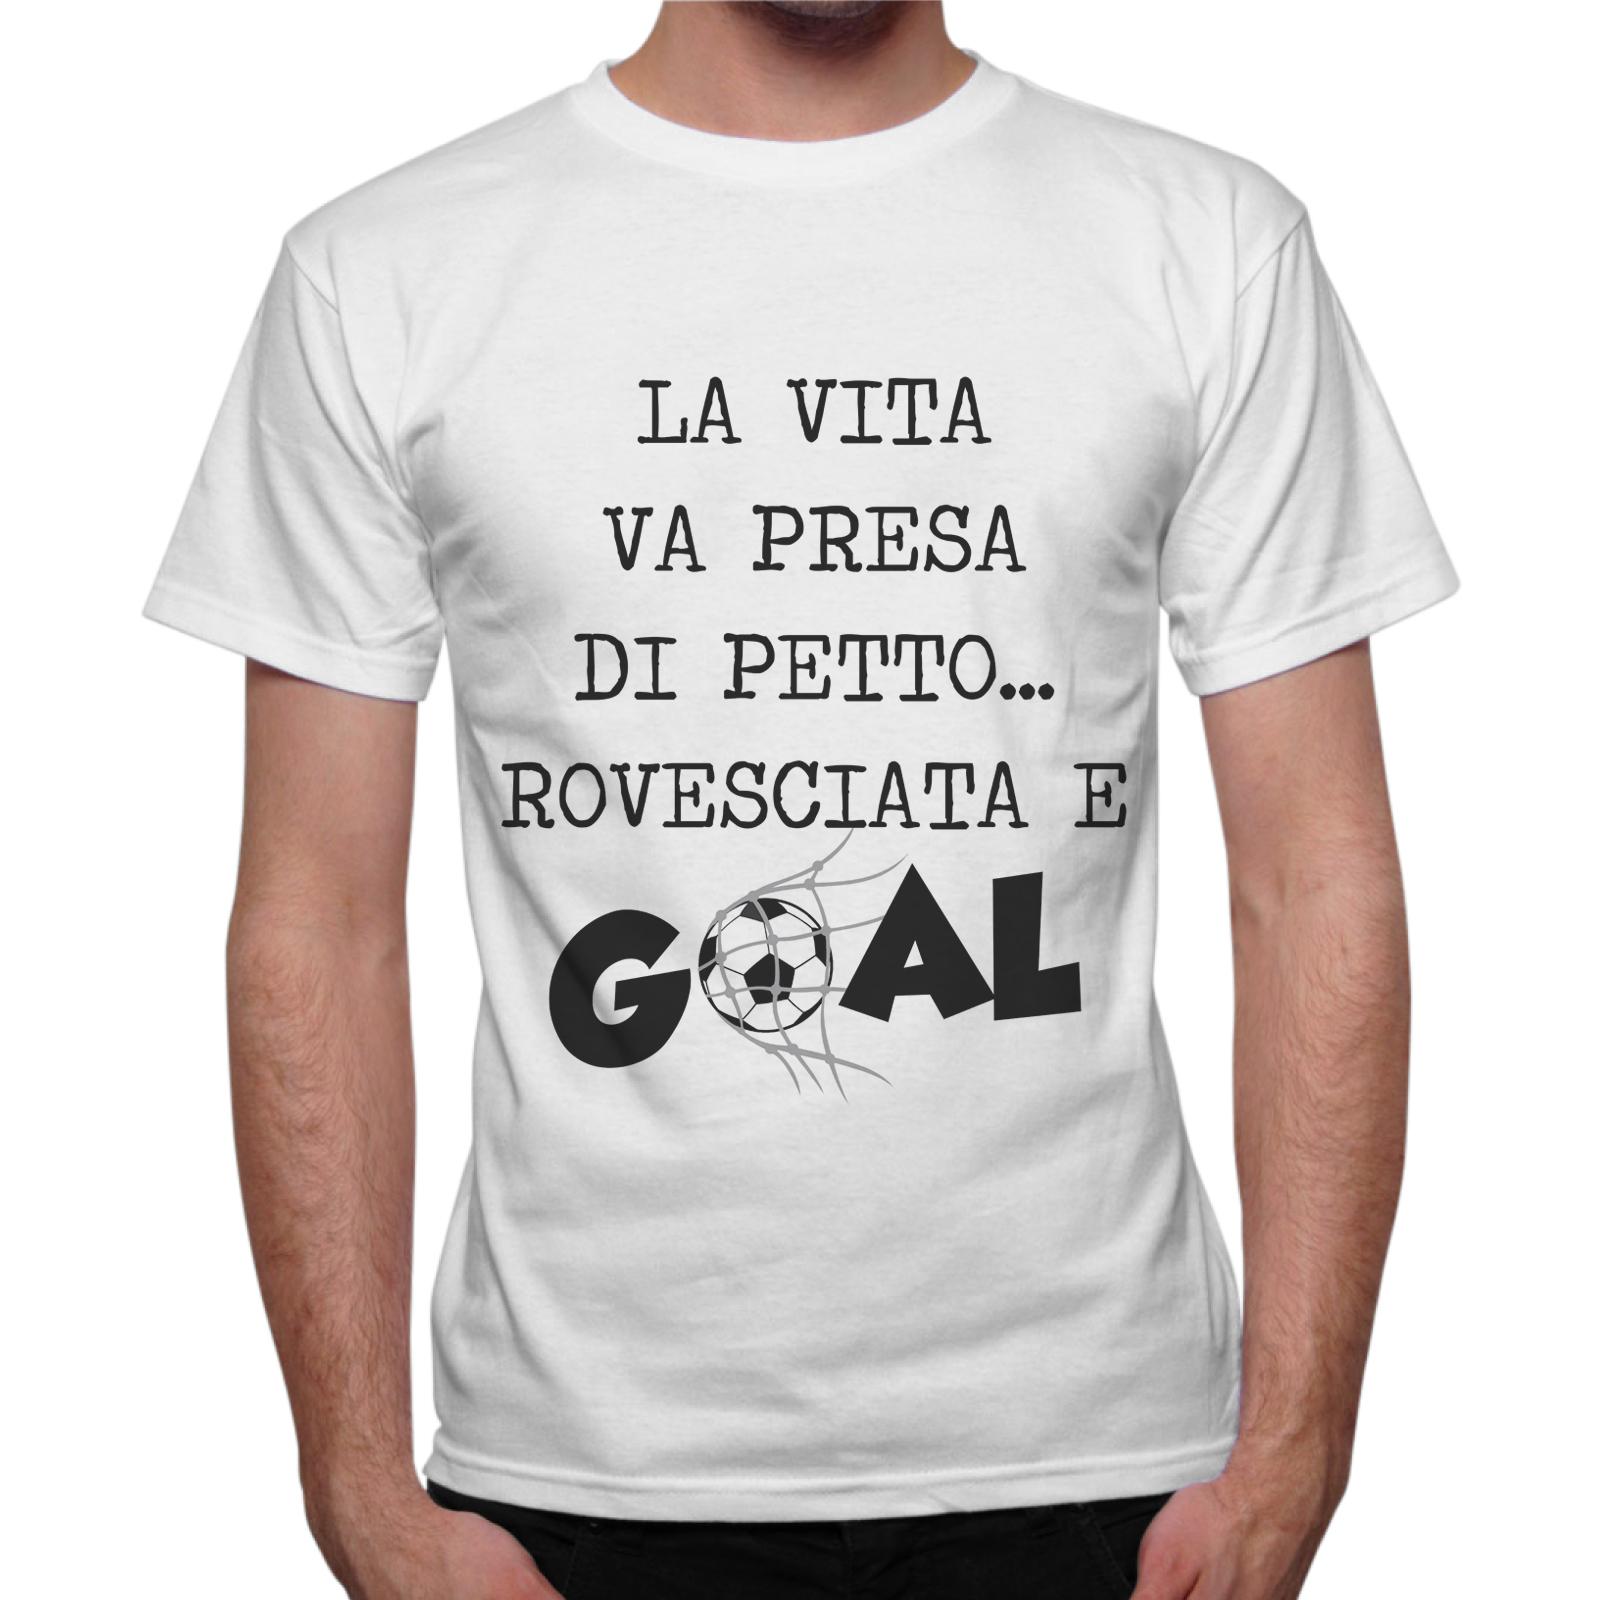 T-Shirt Uomo PETTO ROVESCIATA GOAL